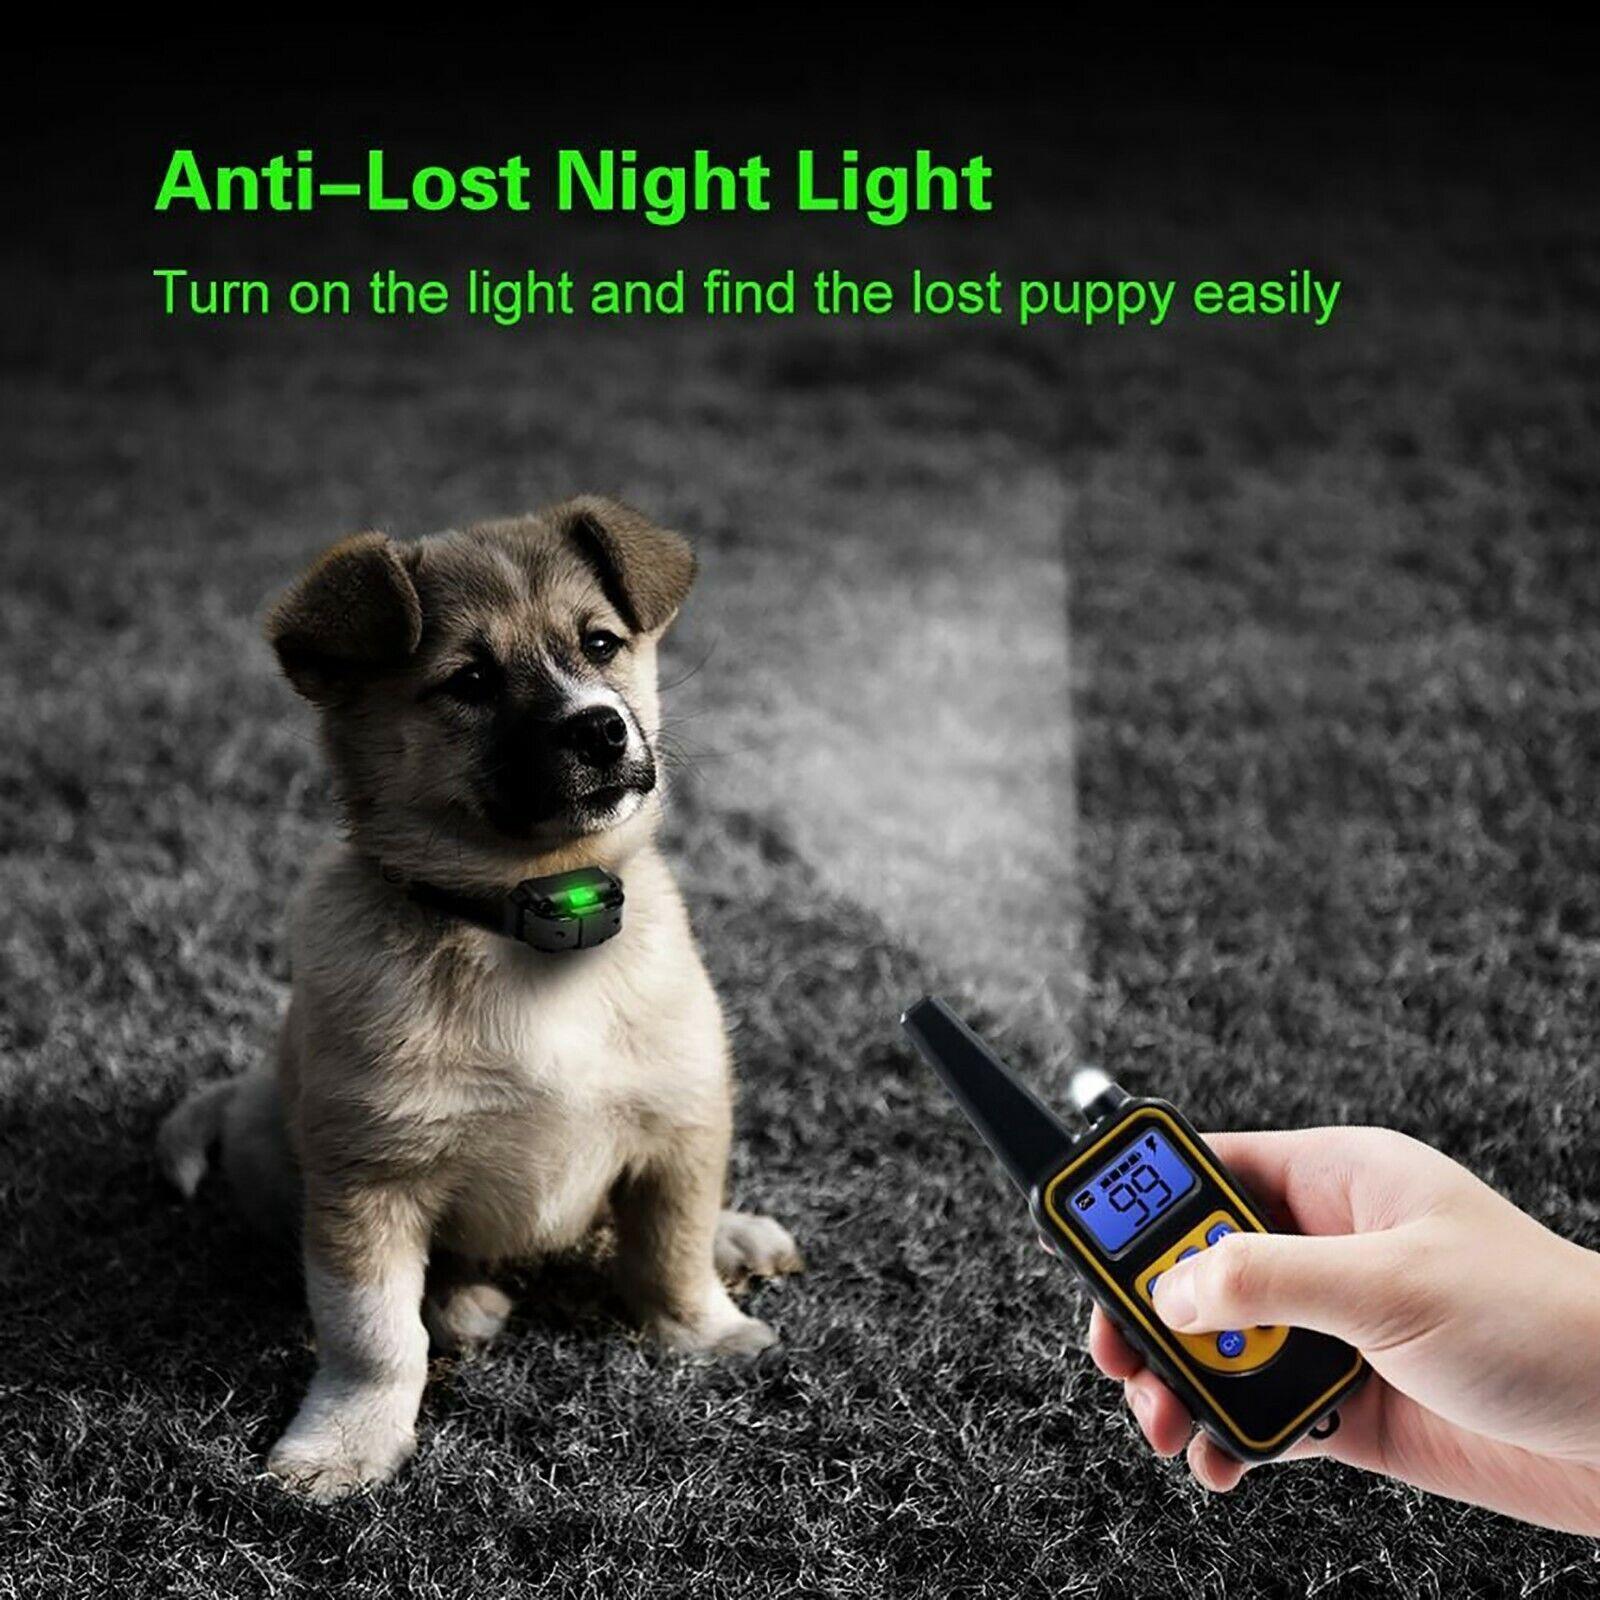 Dog Shock Training Collar Rechargeable Remote Control Waterproof IP67 875 Yards Bark Collars